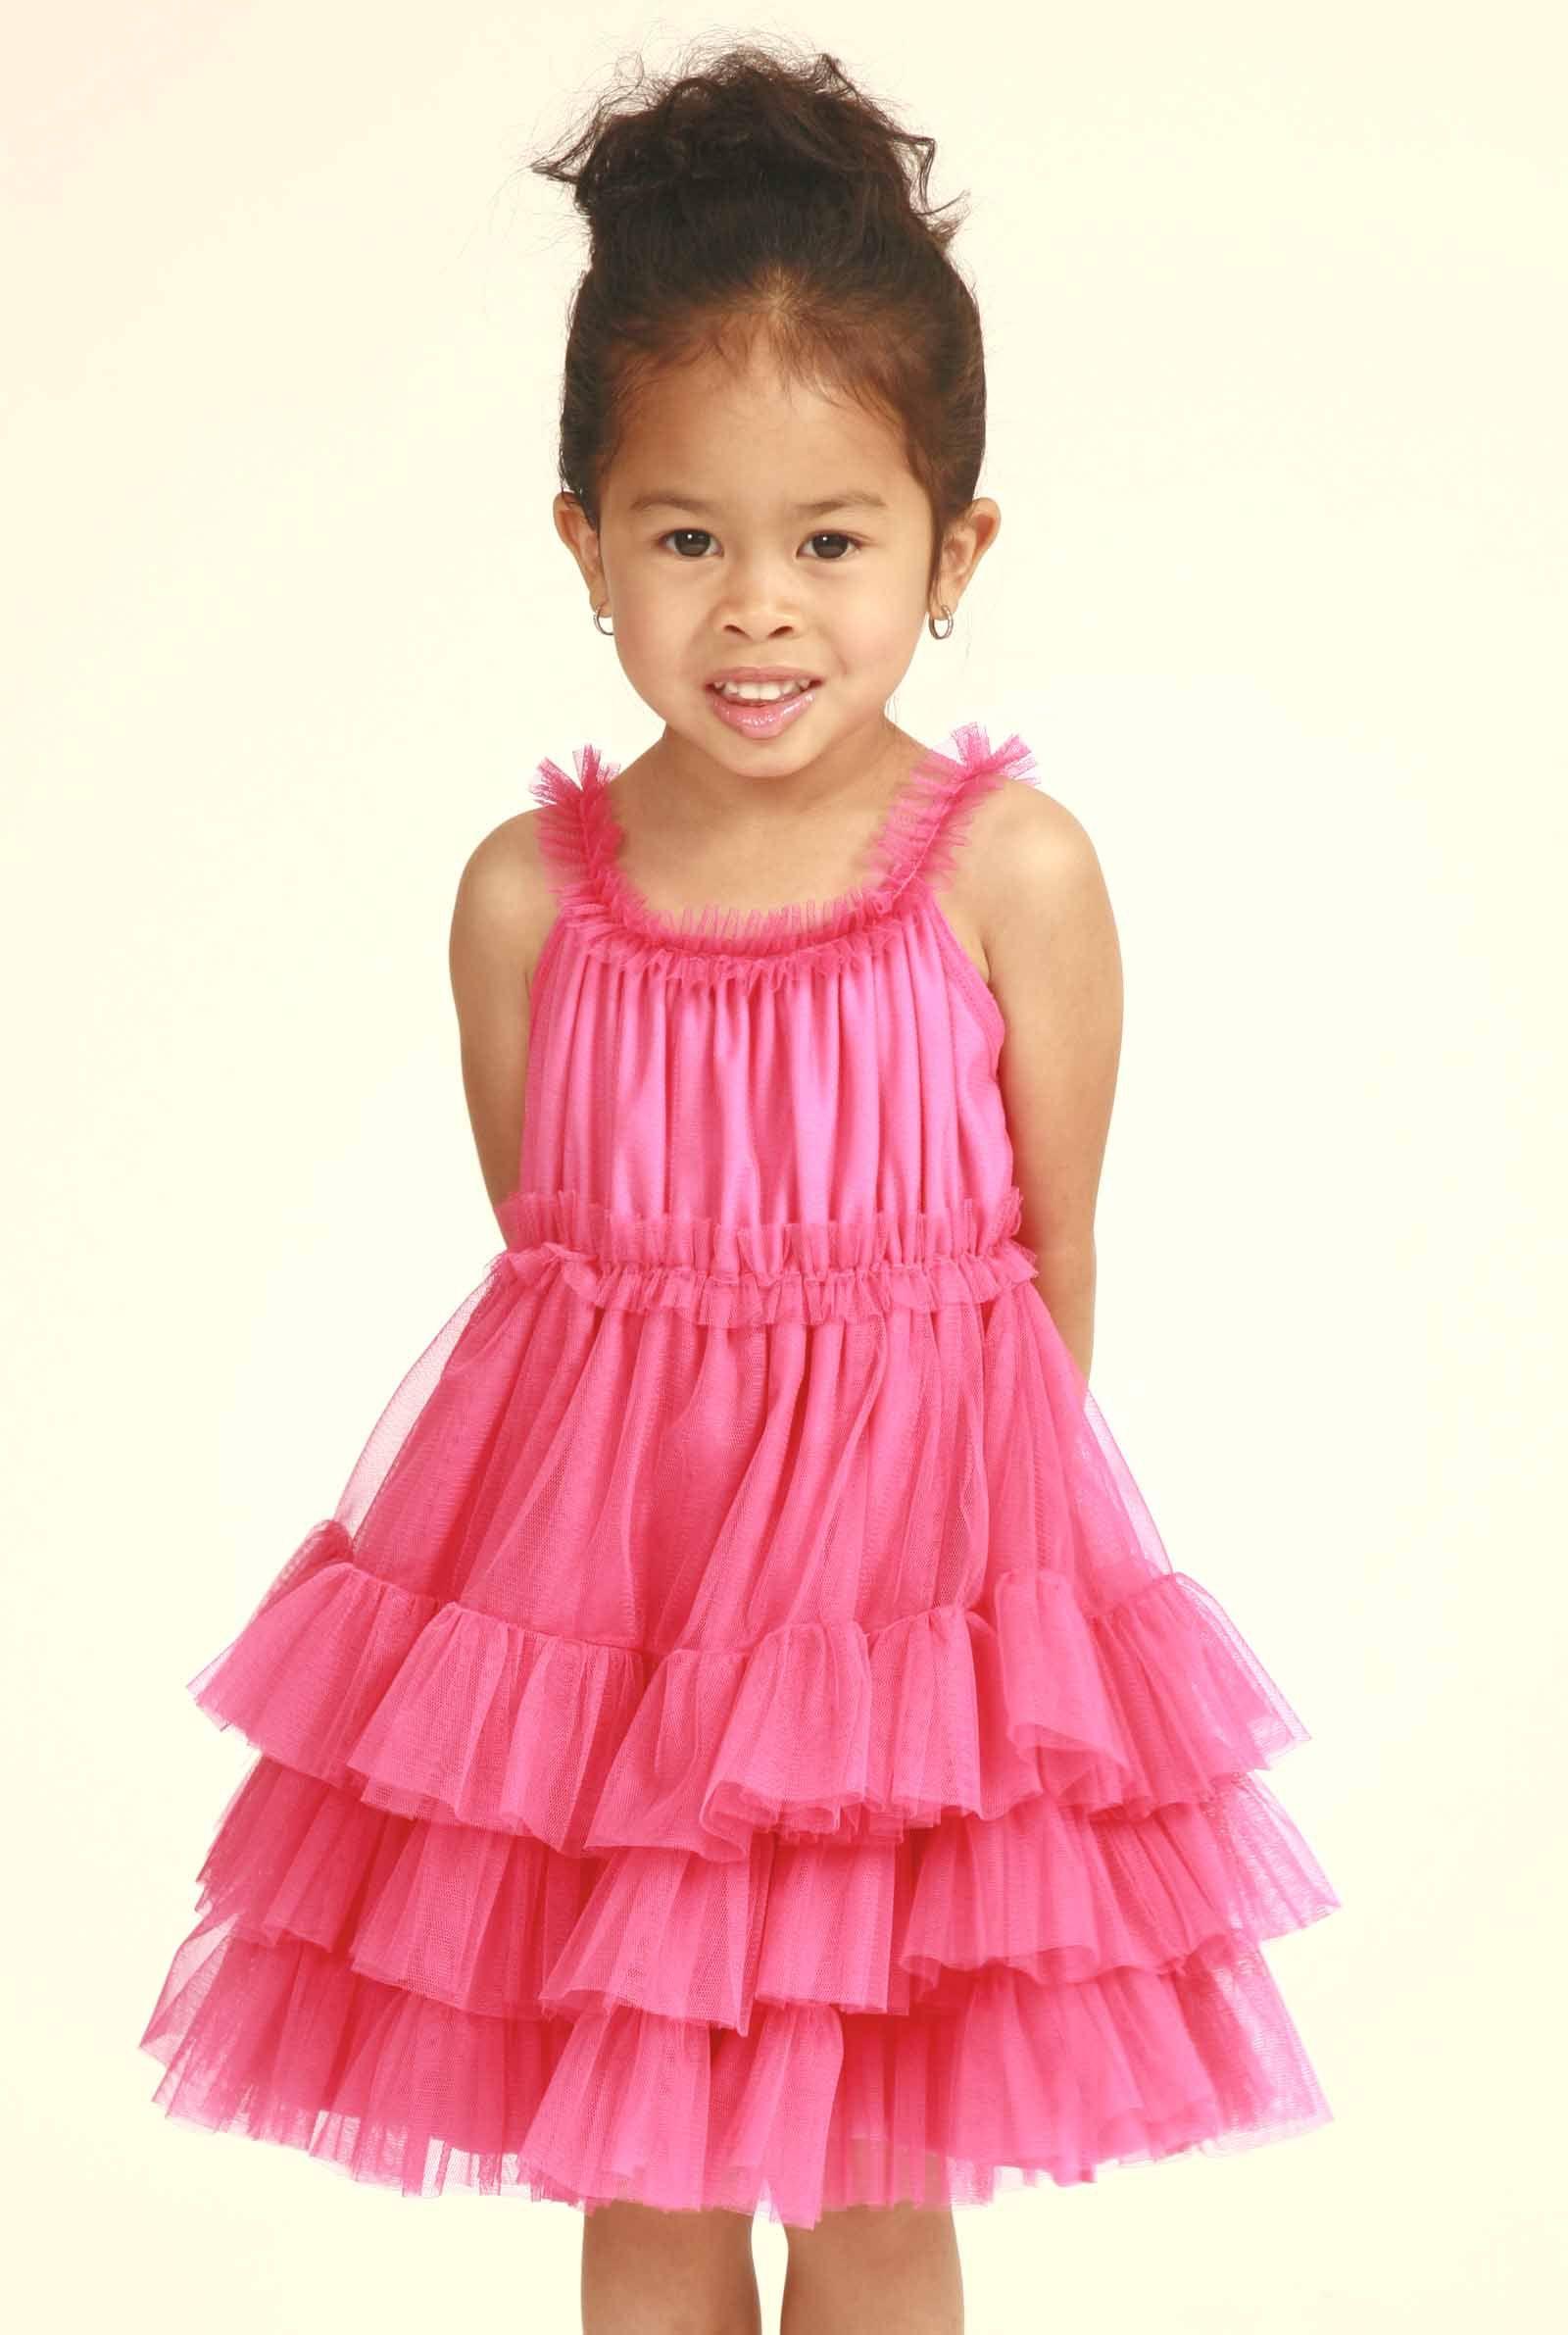 stella industries starlet dress in pink | Little Women Fashion ...